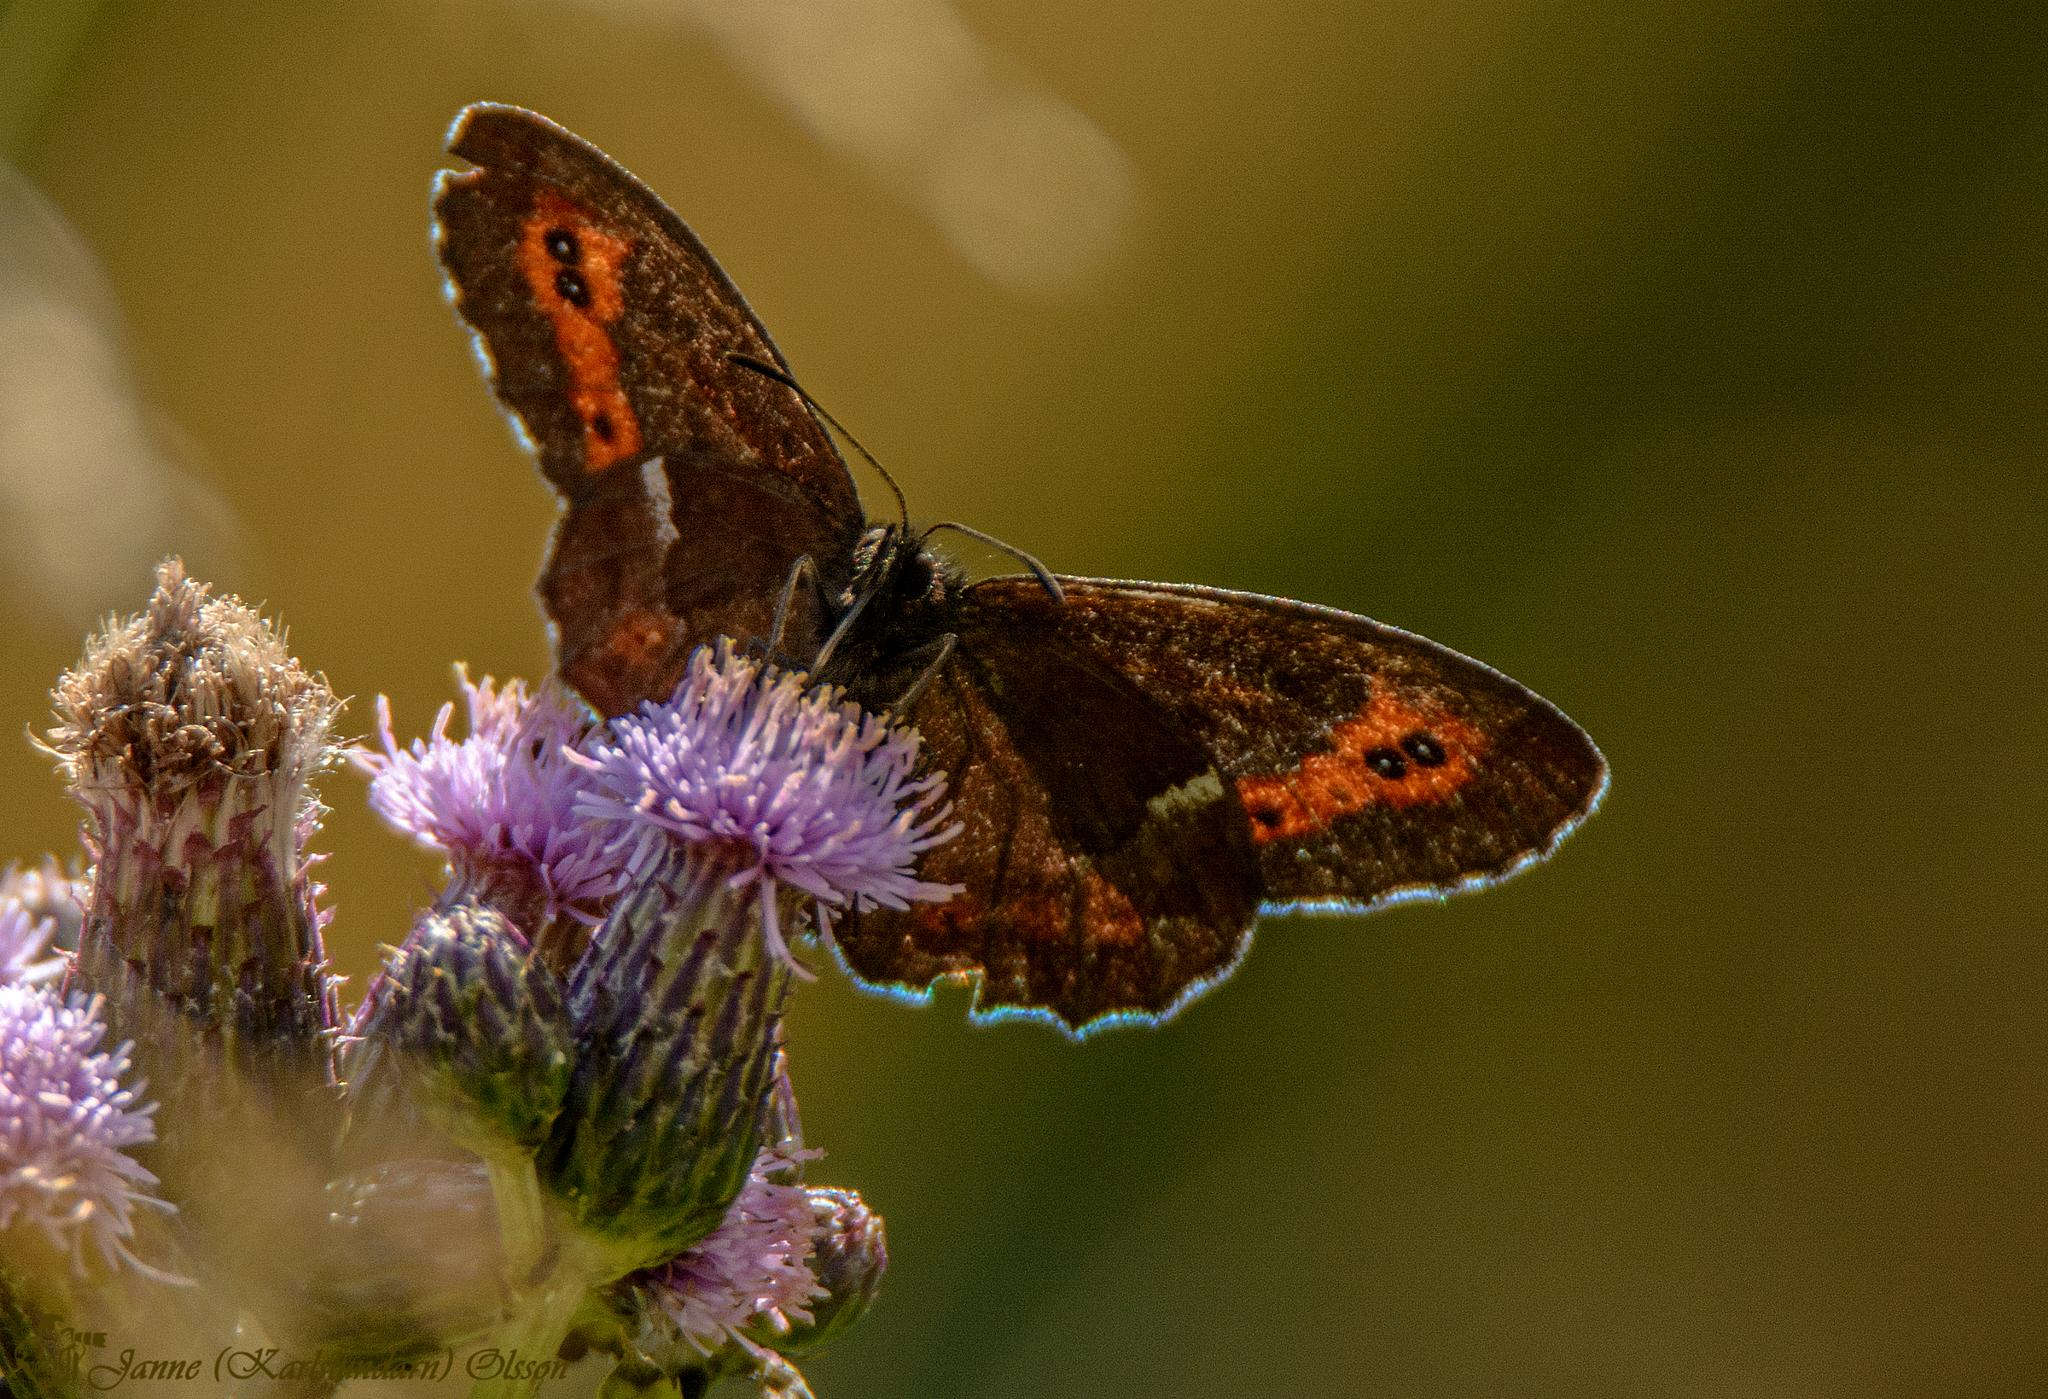 Skogsgräsfjäril (Erebia ligea) by (Karlslundarn)